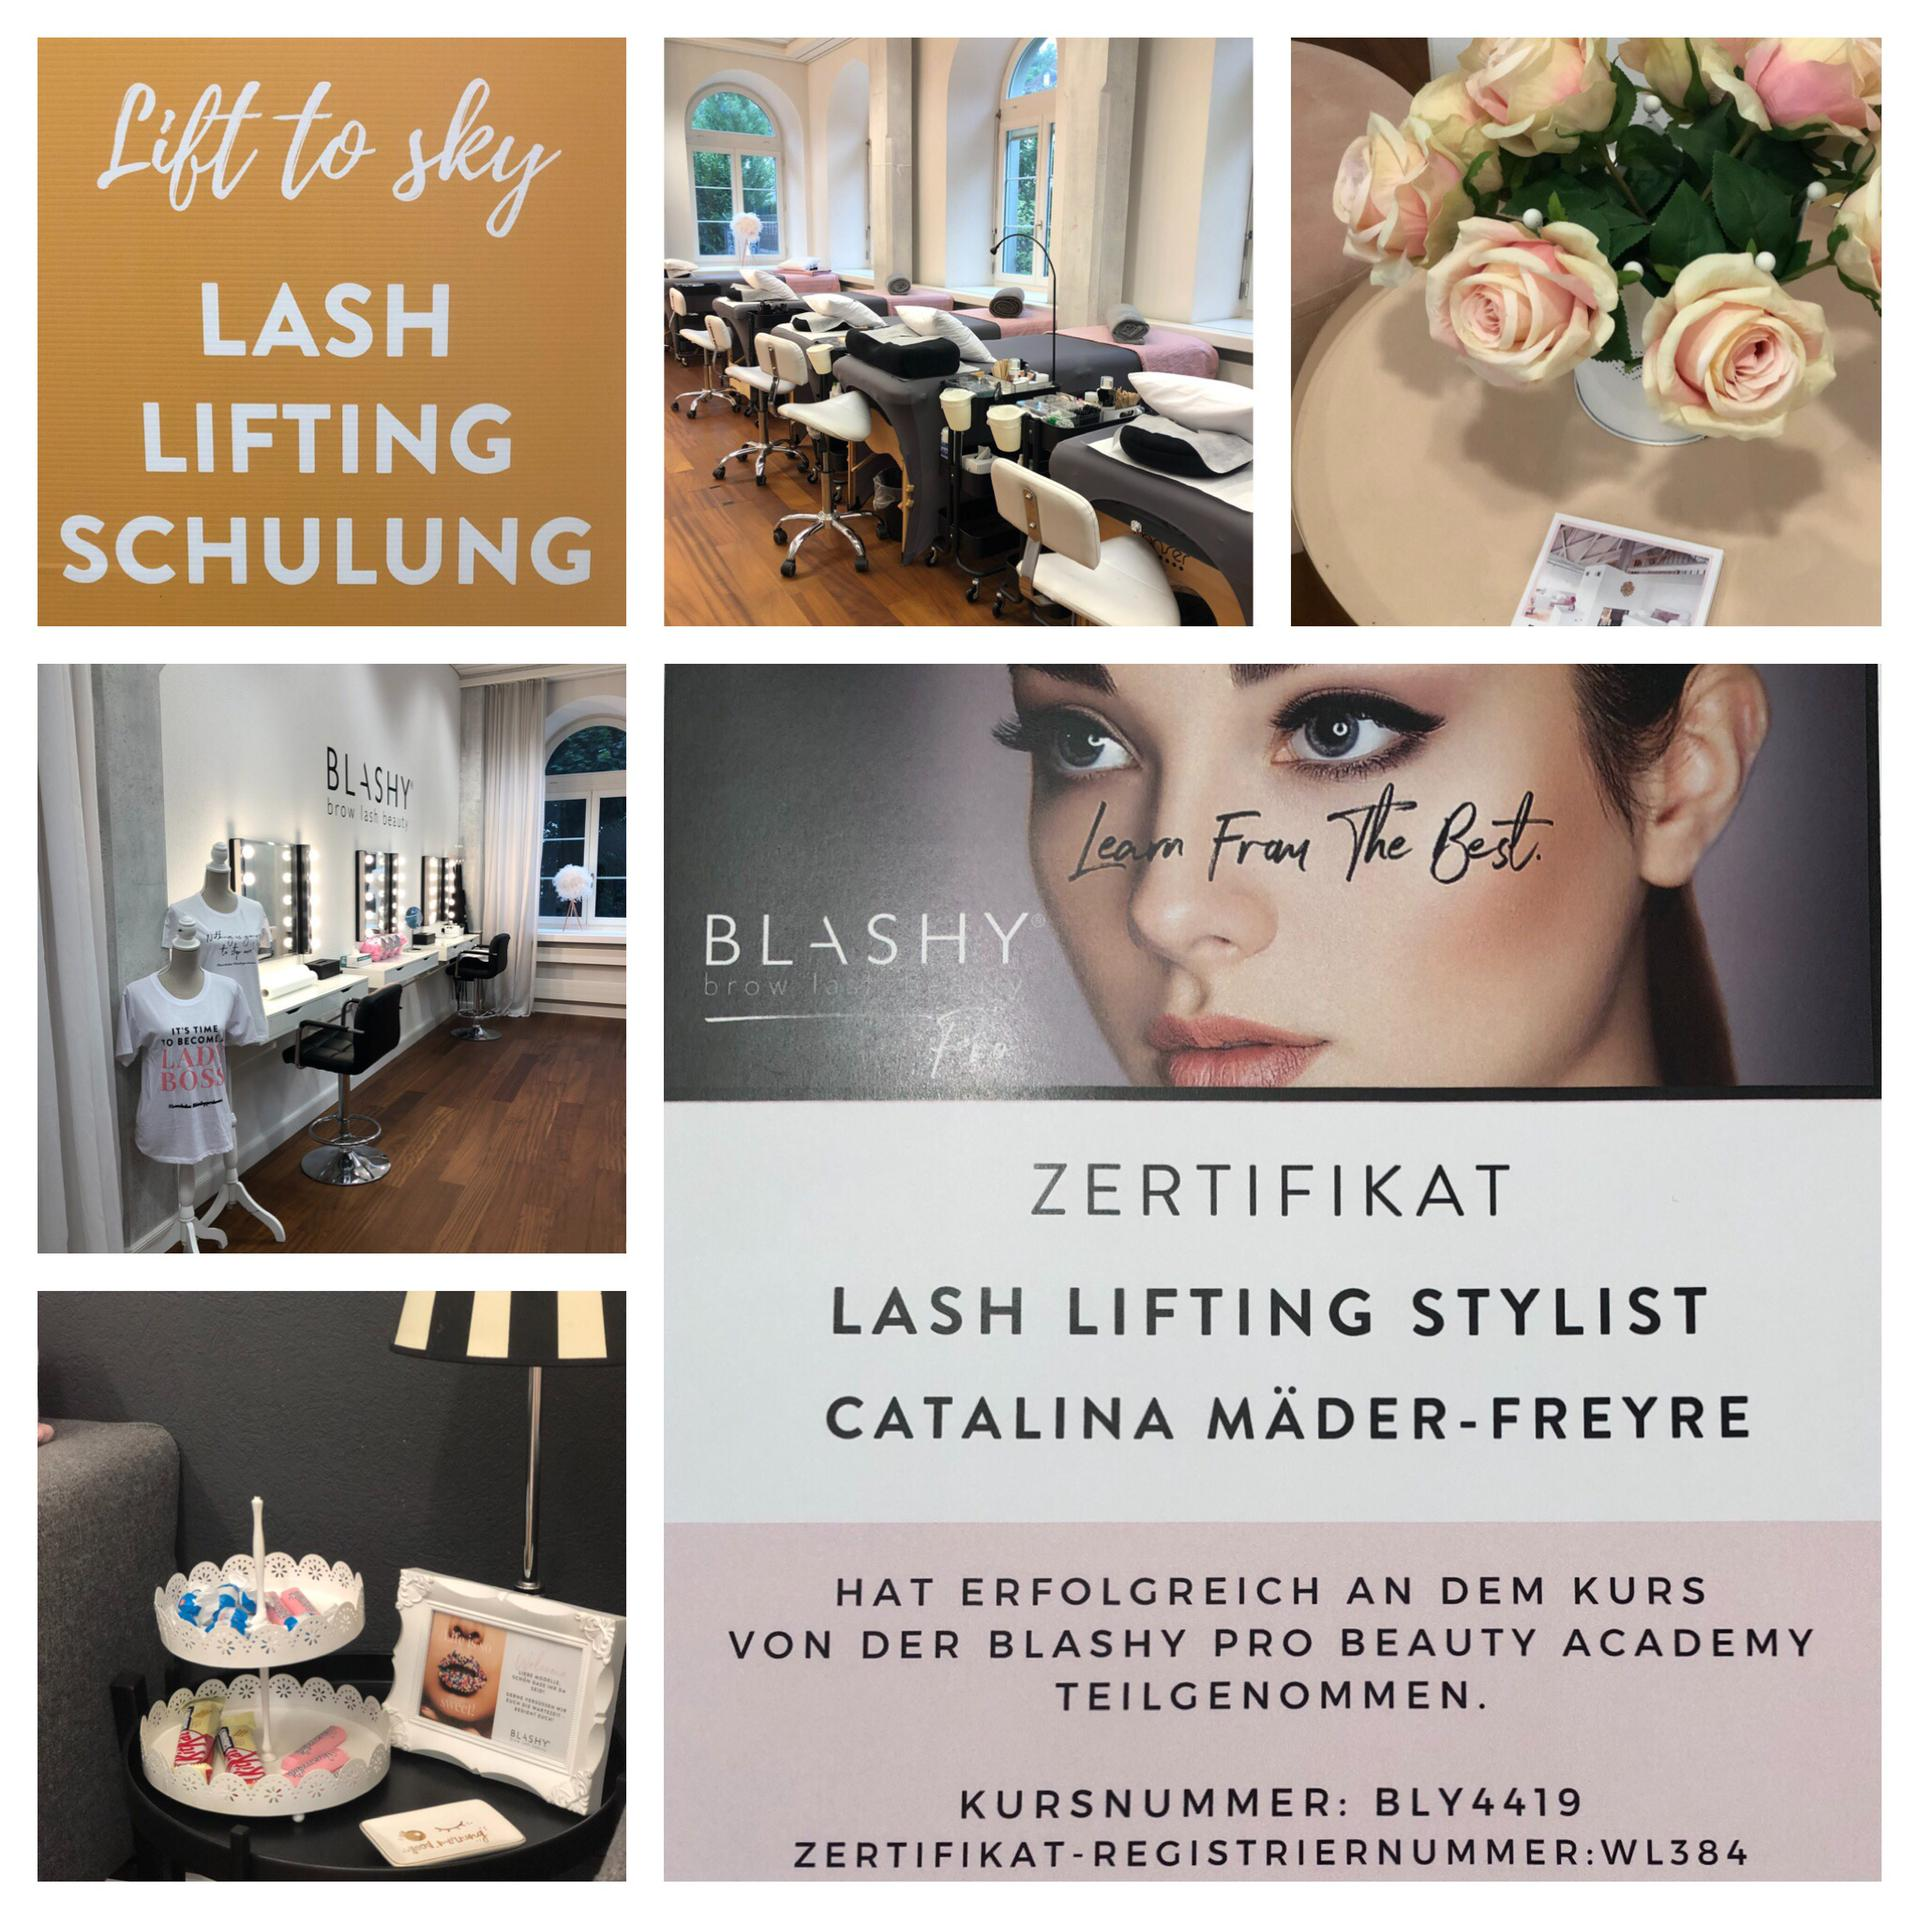 Lash Lifting Stylist avous kosmetik